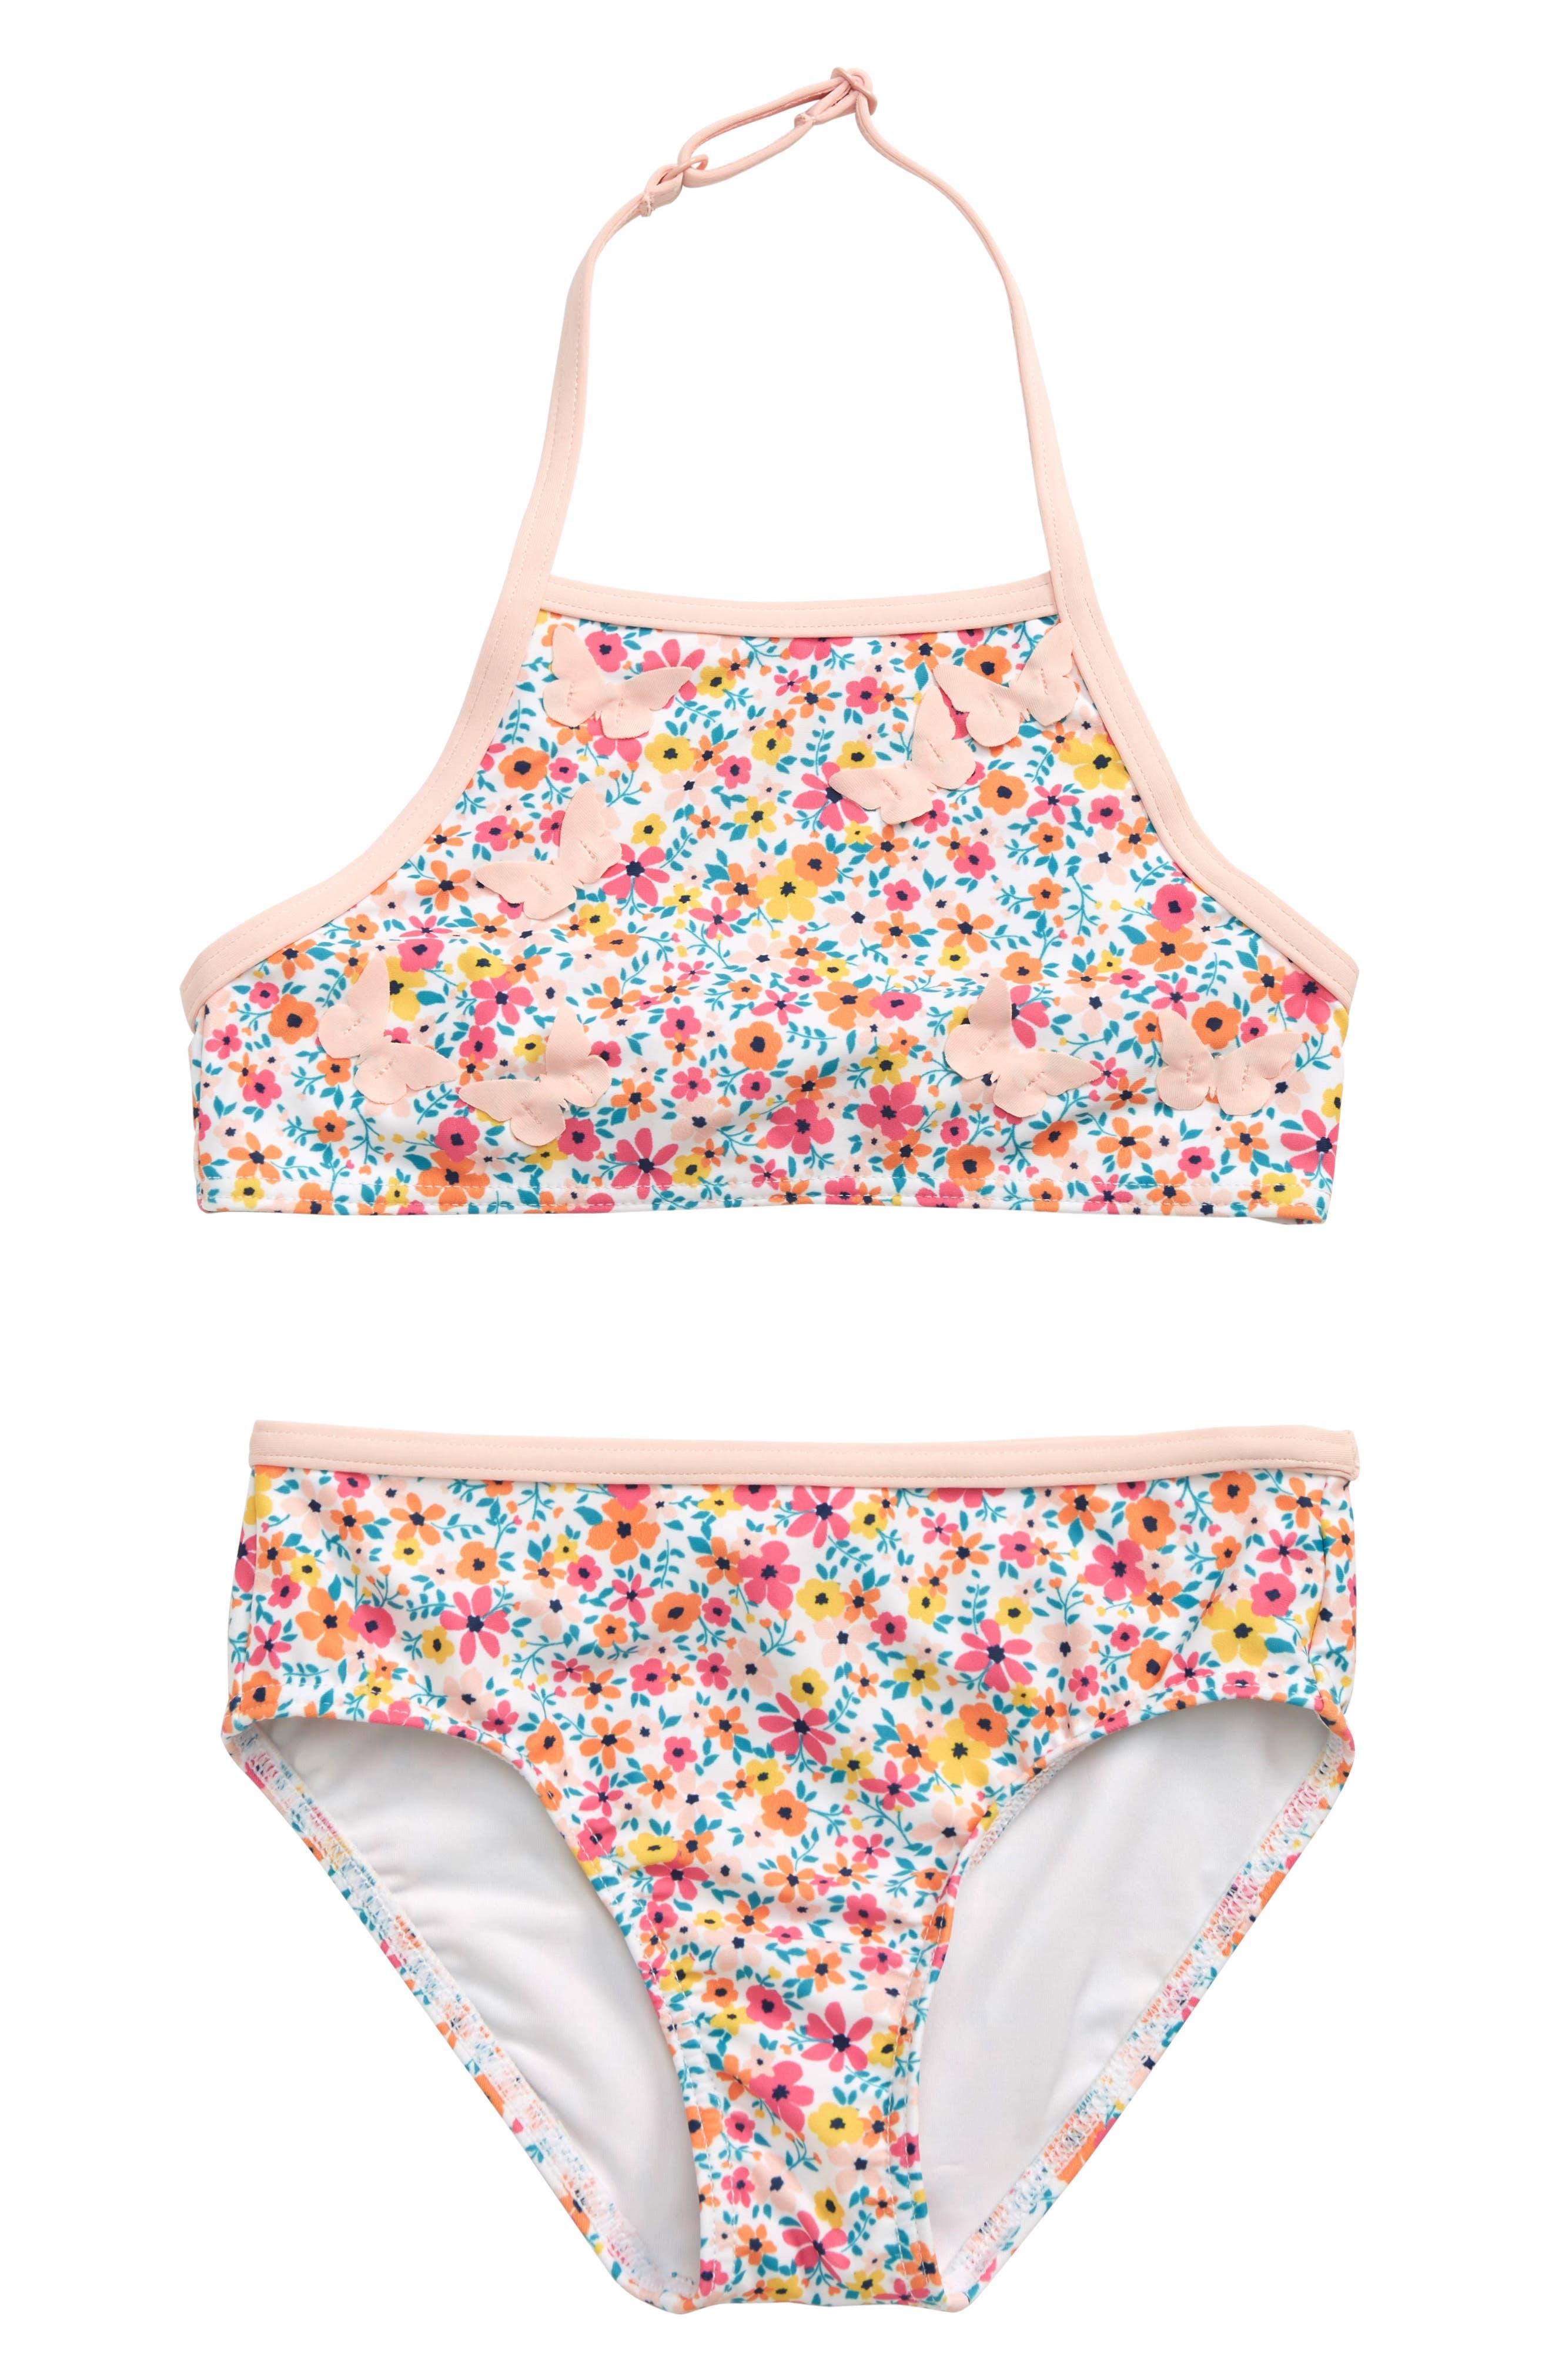 Flamingo Baby Girls Tankini Swimwear Children Girl Ruffles Two Pieces Bikini Set Toddler Girls European And American Bath Suit Swimwear